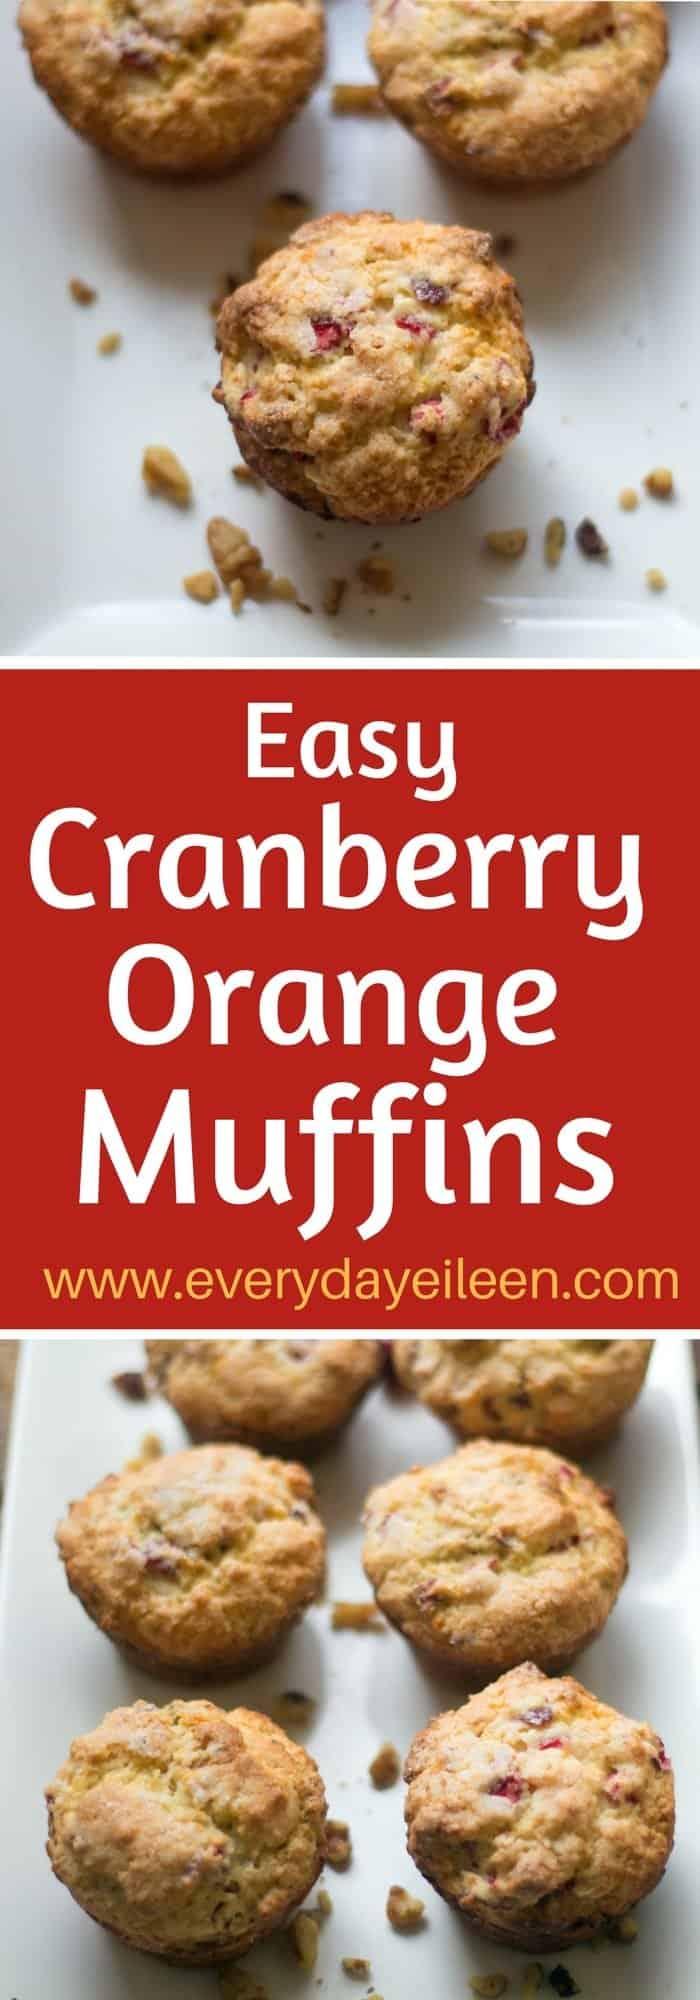 easy cranberry orange muffins